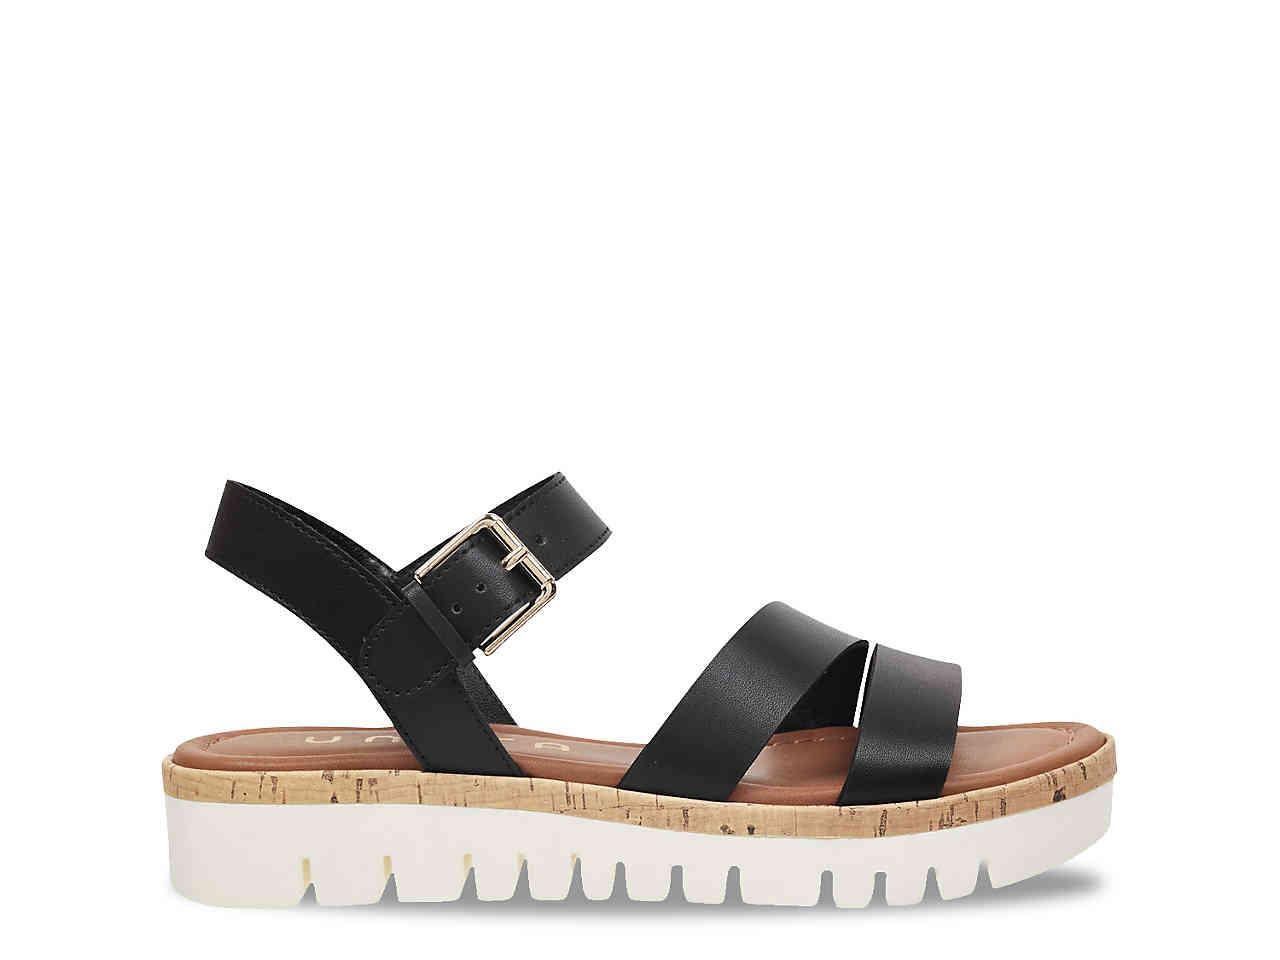 Unisa Brok Platform Sandal in Black - Lyst